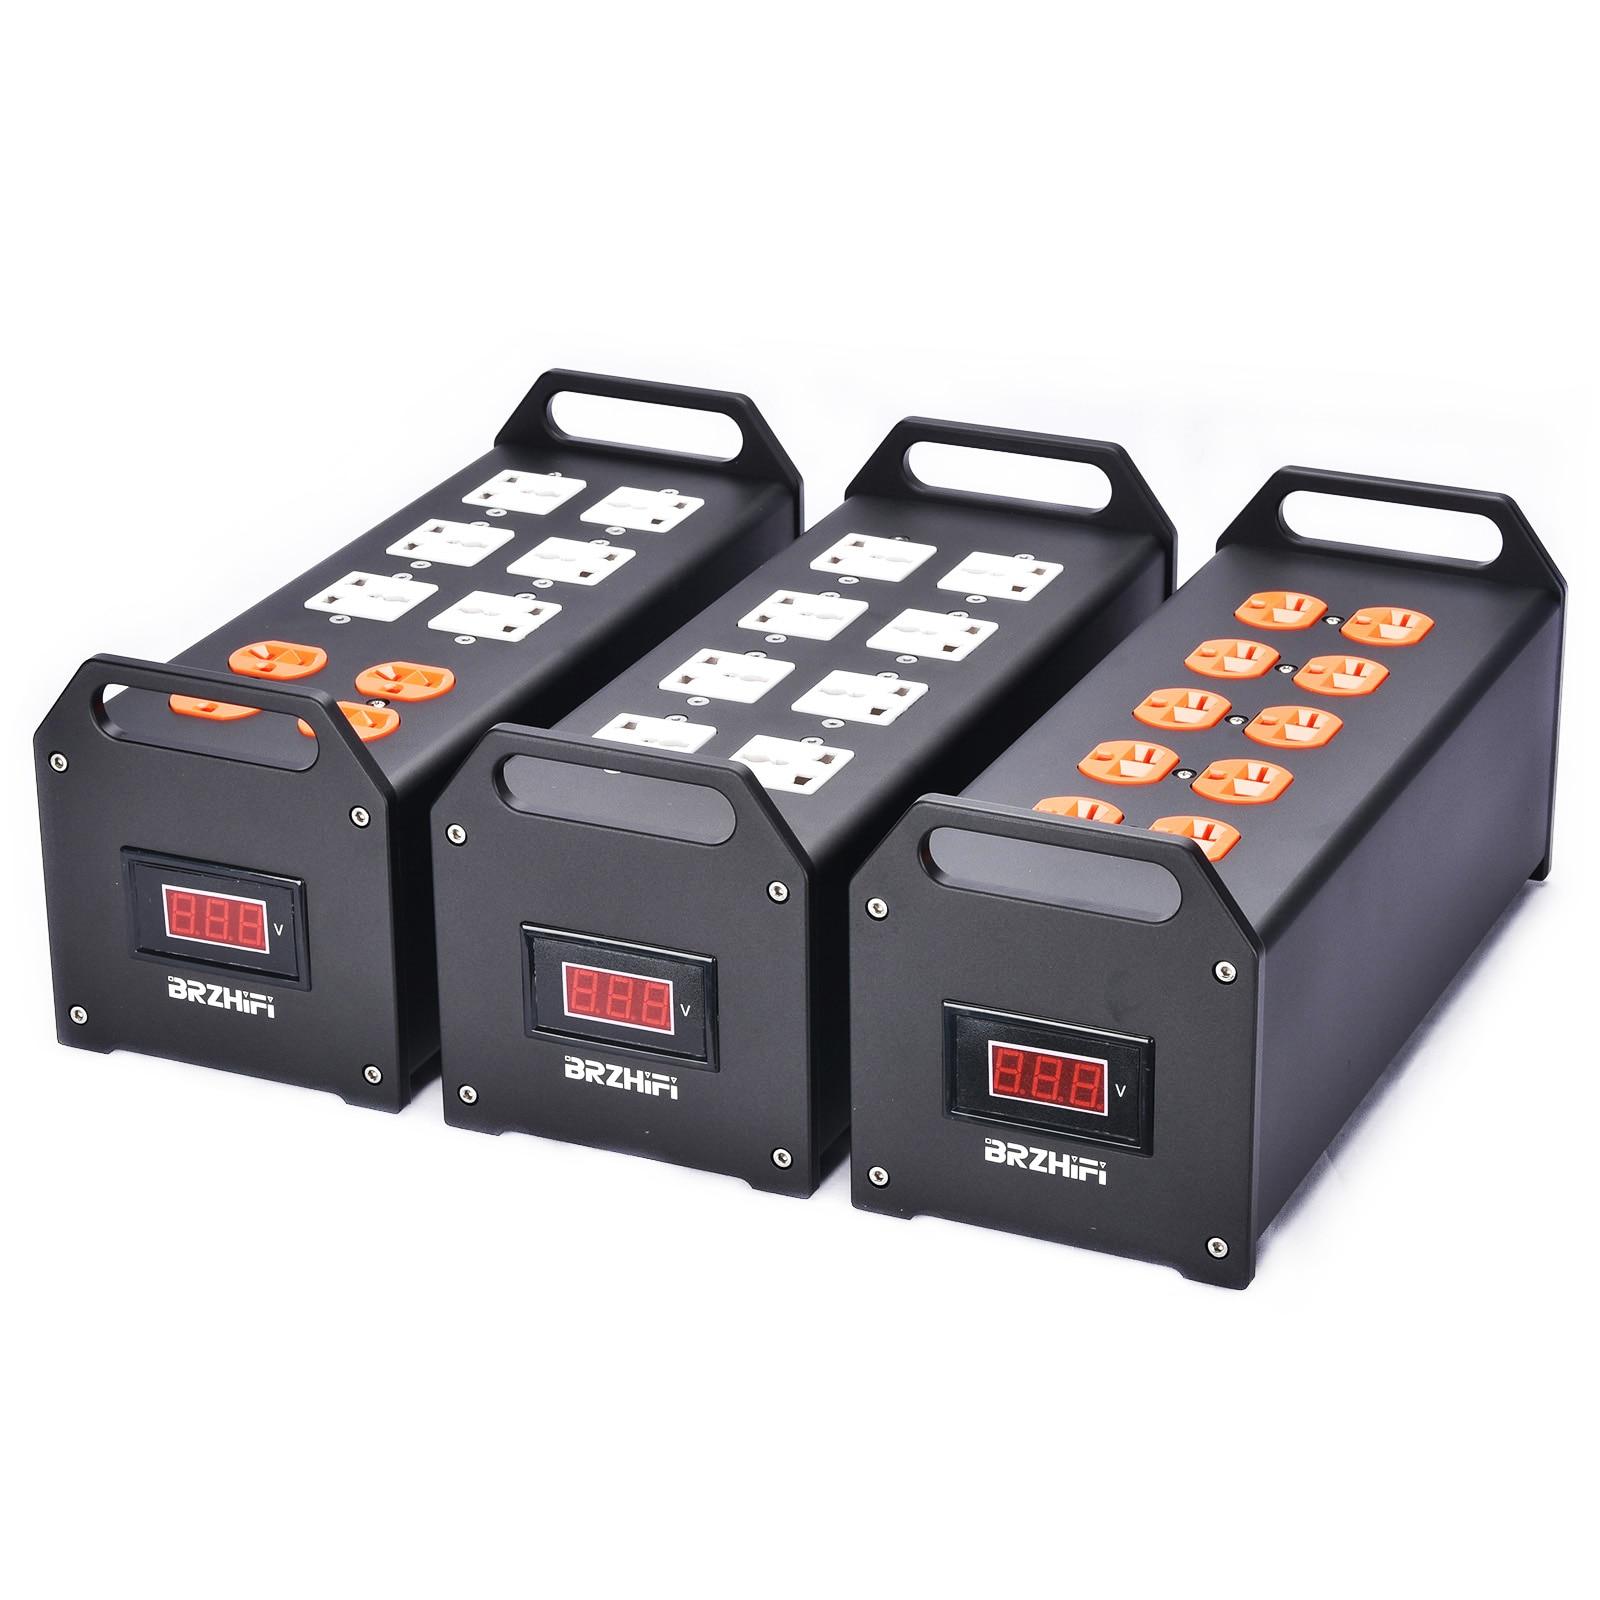 New PW1 4000W 20A High-End Audio Power Purifier, AC Power Conditioner, Power Filter, Power Purifier Power Strip